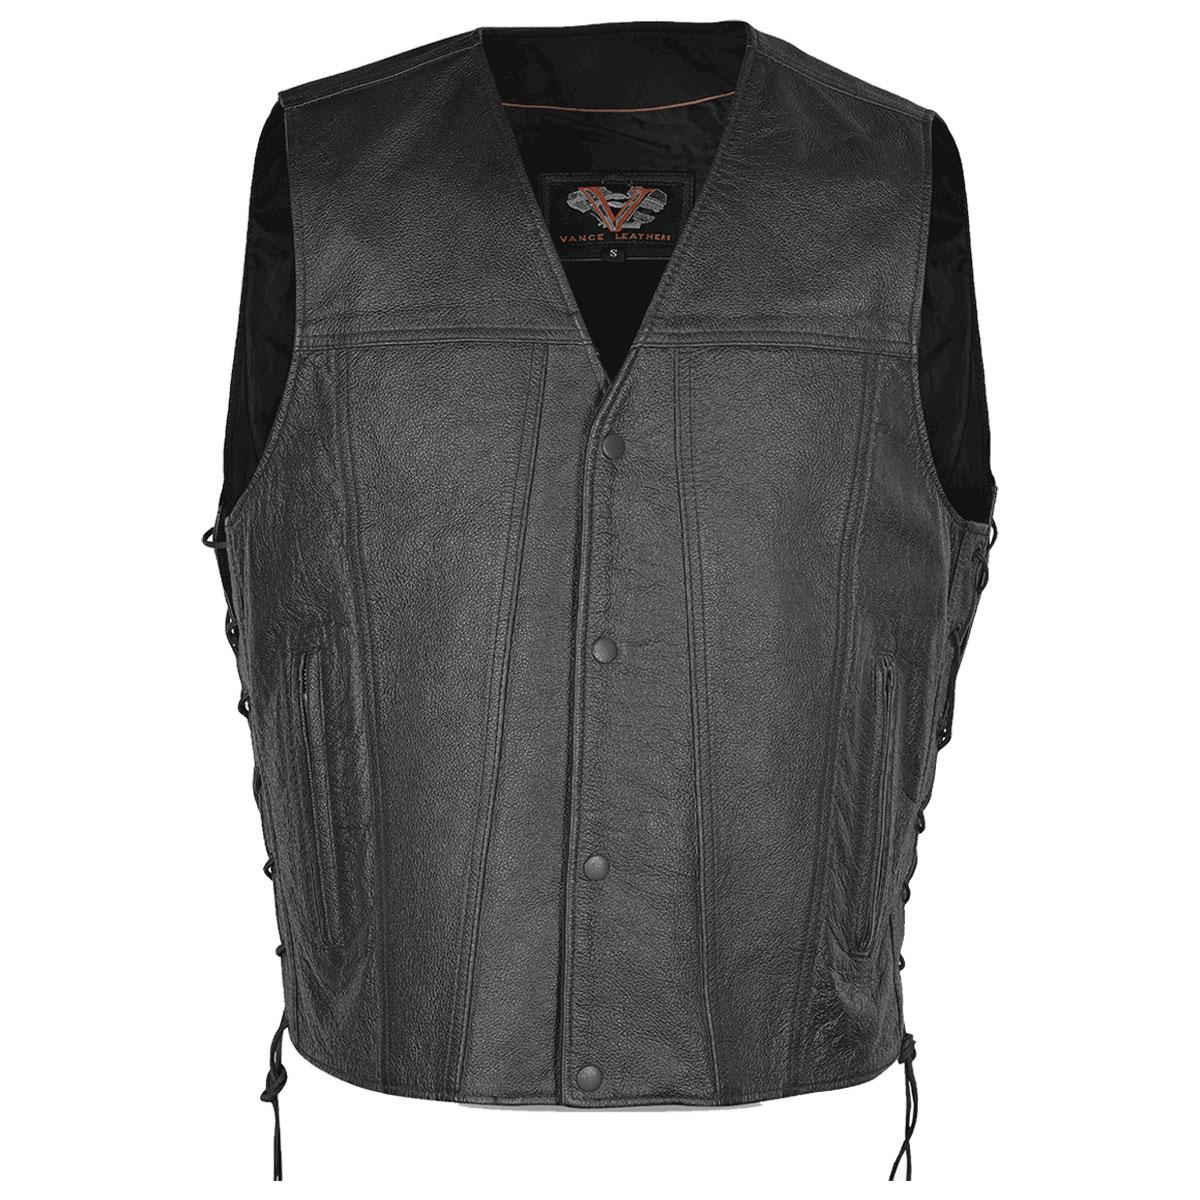 Vance Leathers Men's Gambler Black Leather Vest